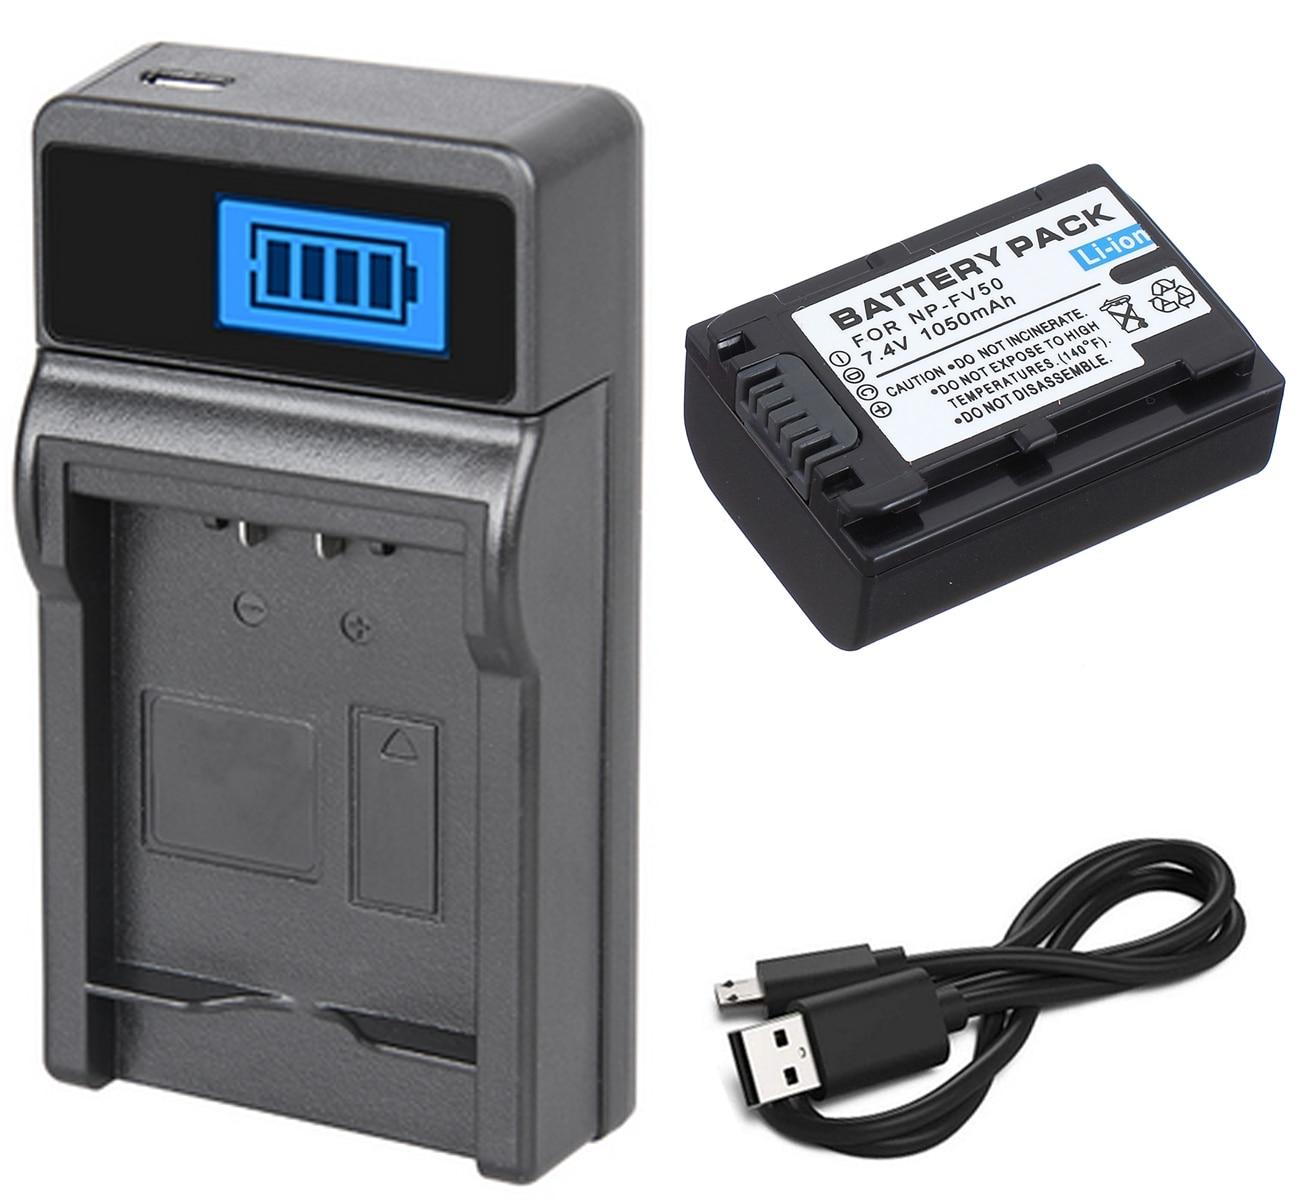 Paquete de batería + cargador para videocámara Sony HDR-XR150E, HDR-XR155E, HDR-XR160E, HDR-XR260VE,...